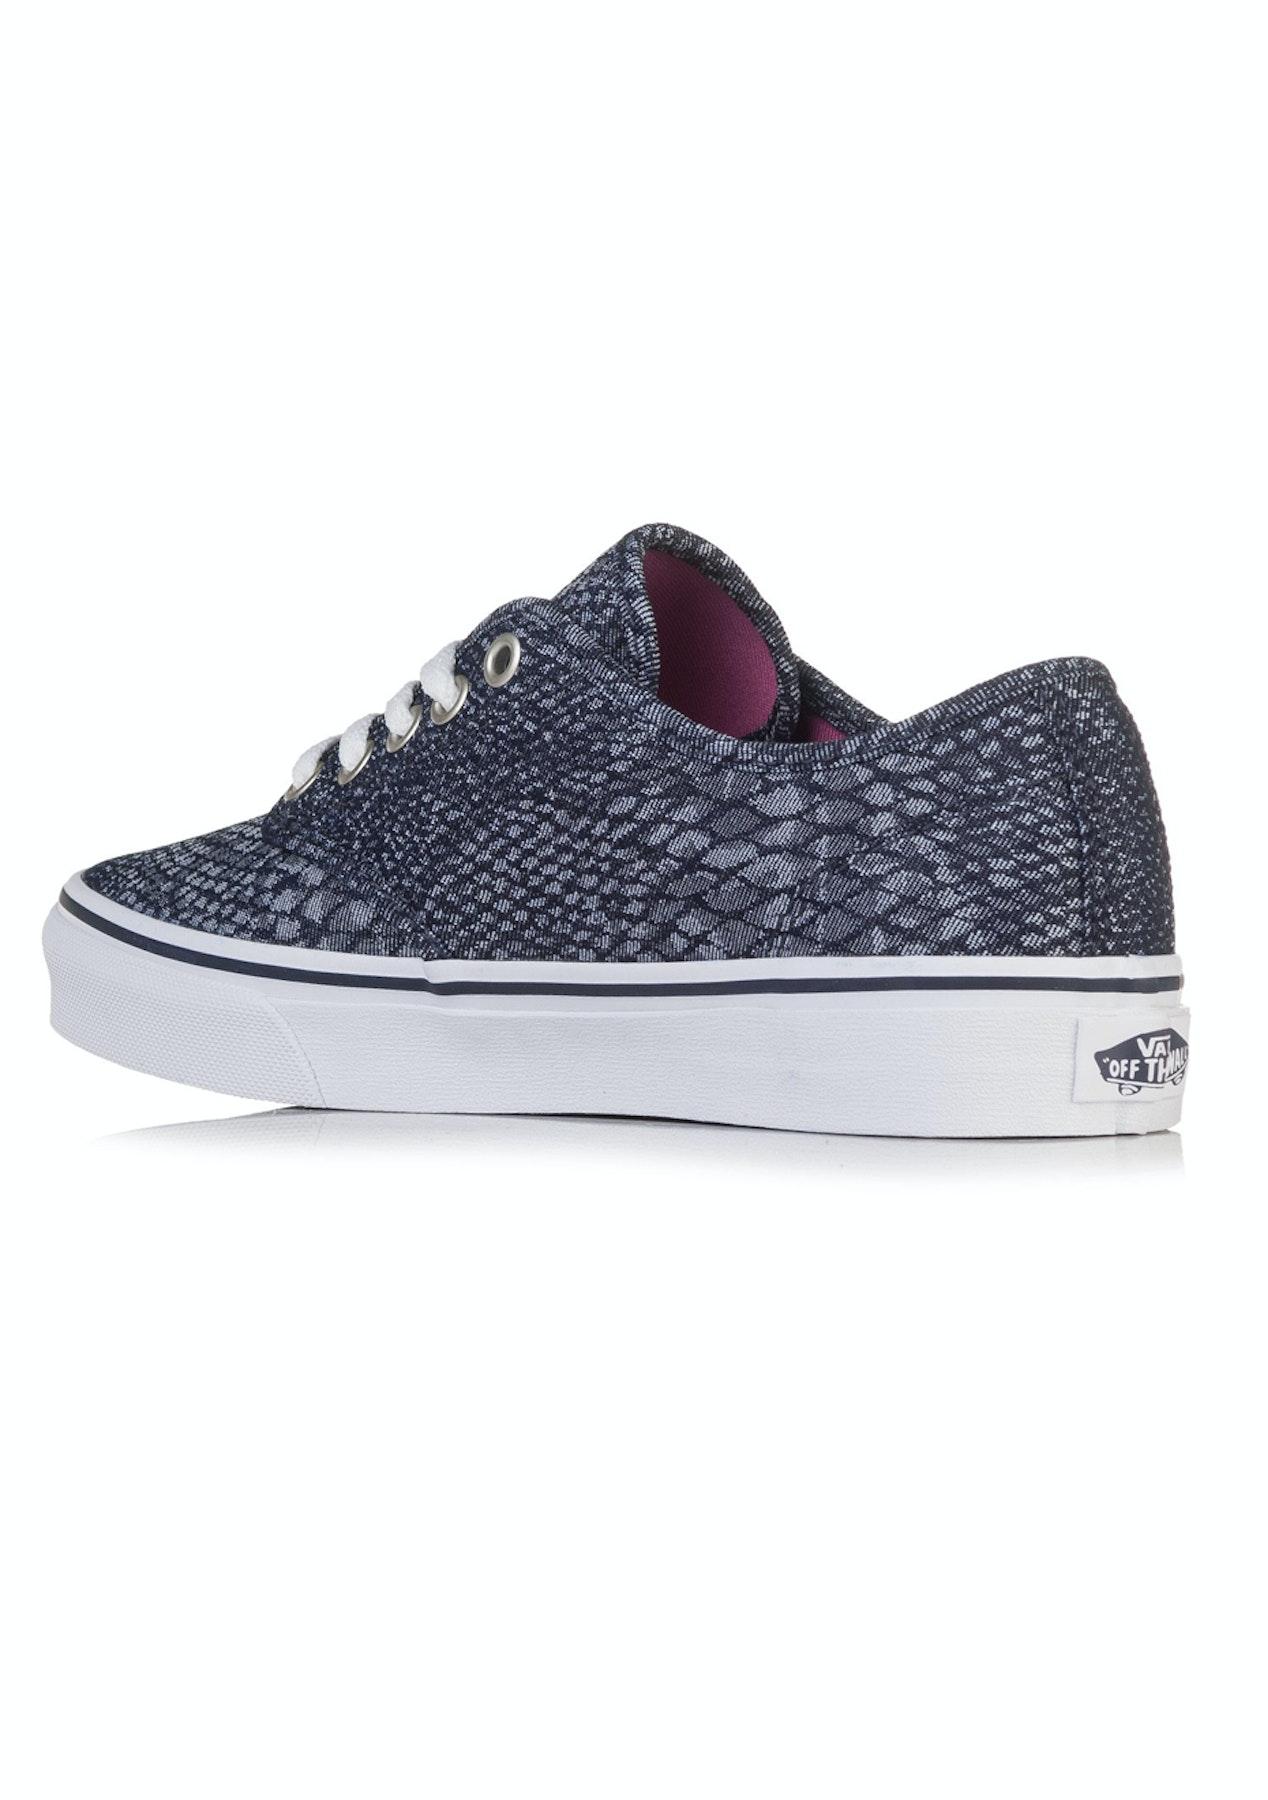 e4a43e1d34 Vans - Womens Camden Stripe Snake - Jacquard Navy - Shoe Steals - Last Ones  - Onceit